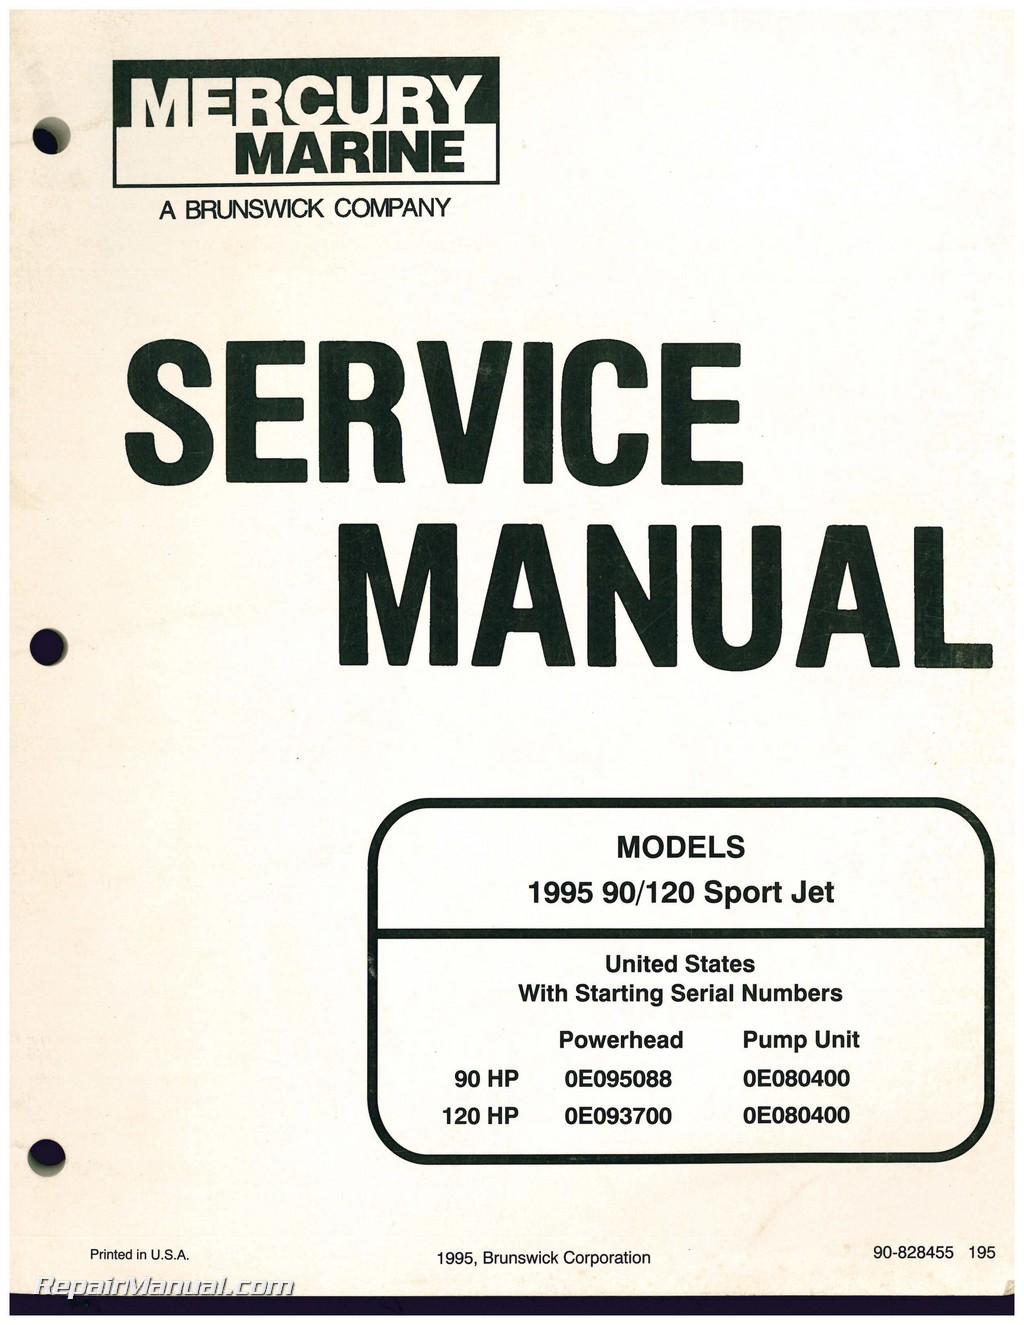 used 1995 mercury 90 120 sport jet engine service manual rh repairmanual com mercury sport jet 175 repair manual mercury 120 sport jet repair manual